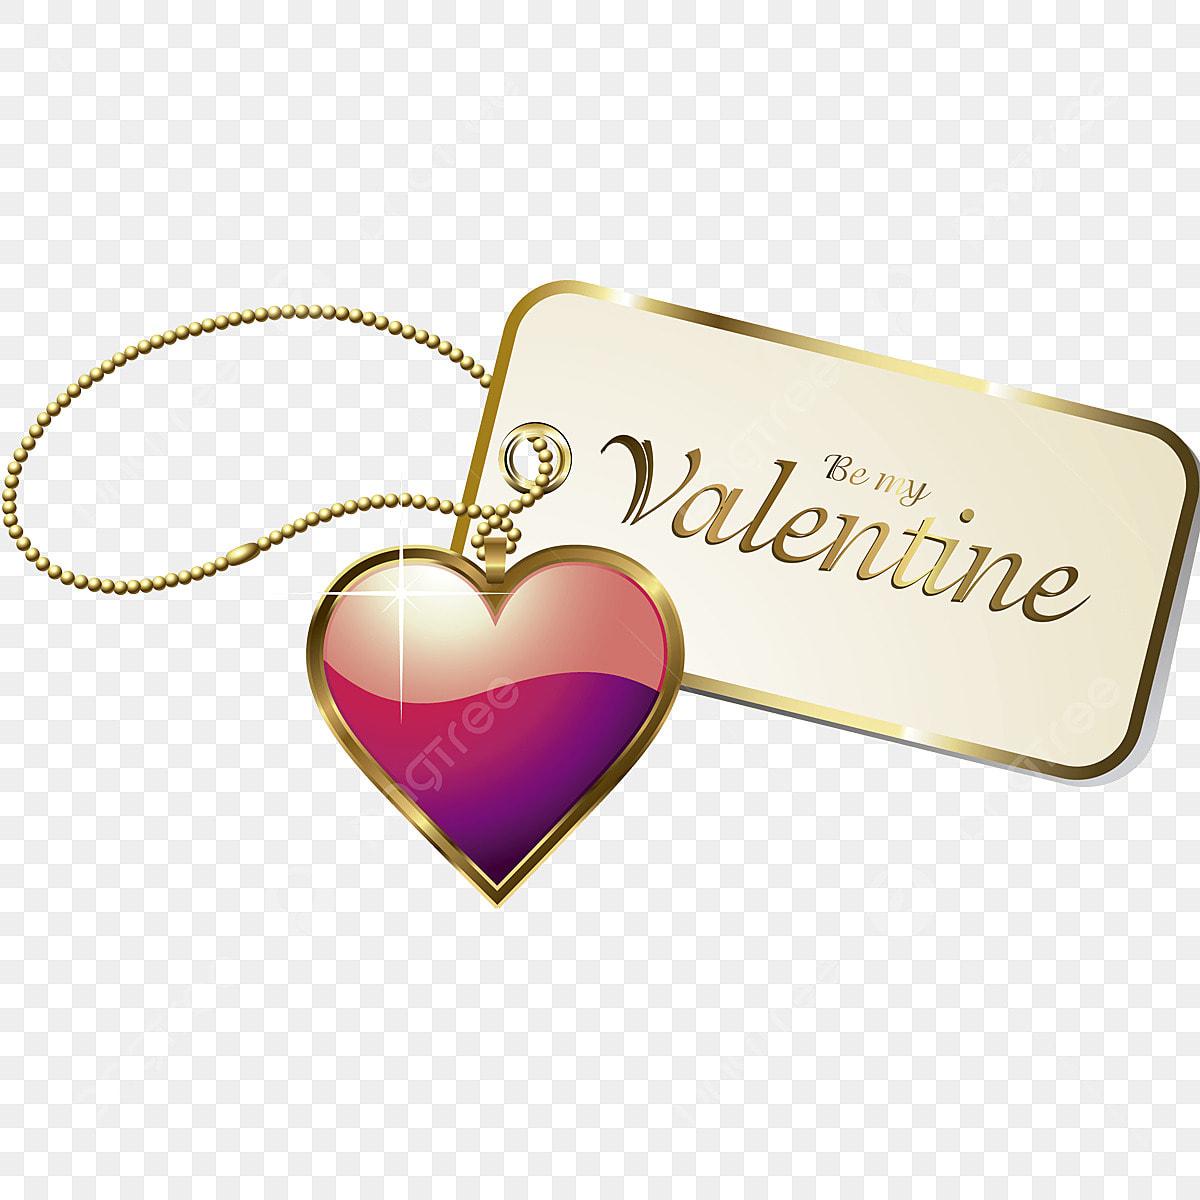 San Valentin Png - Feliz Dia De San Valentin Png Clipart - Large Size Png  Image - PikPng